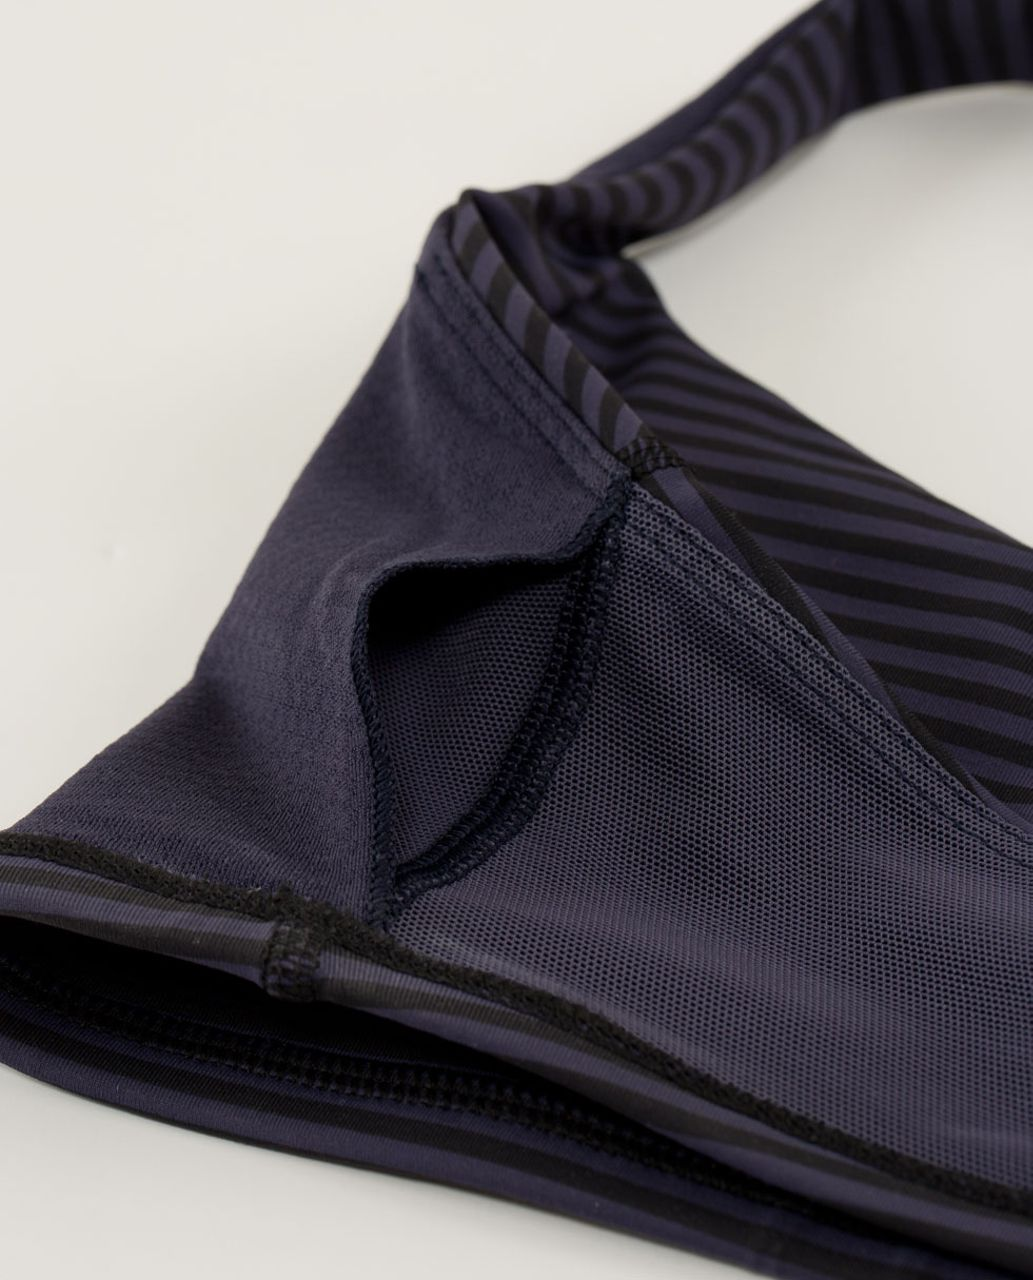 Lululemon Free To Be Bra - 1 / 8 Stripe Cadet Blue / Cadet Blue / Black